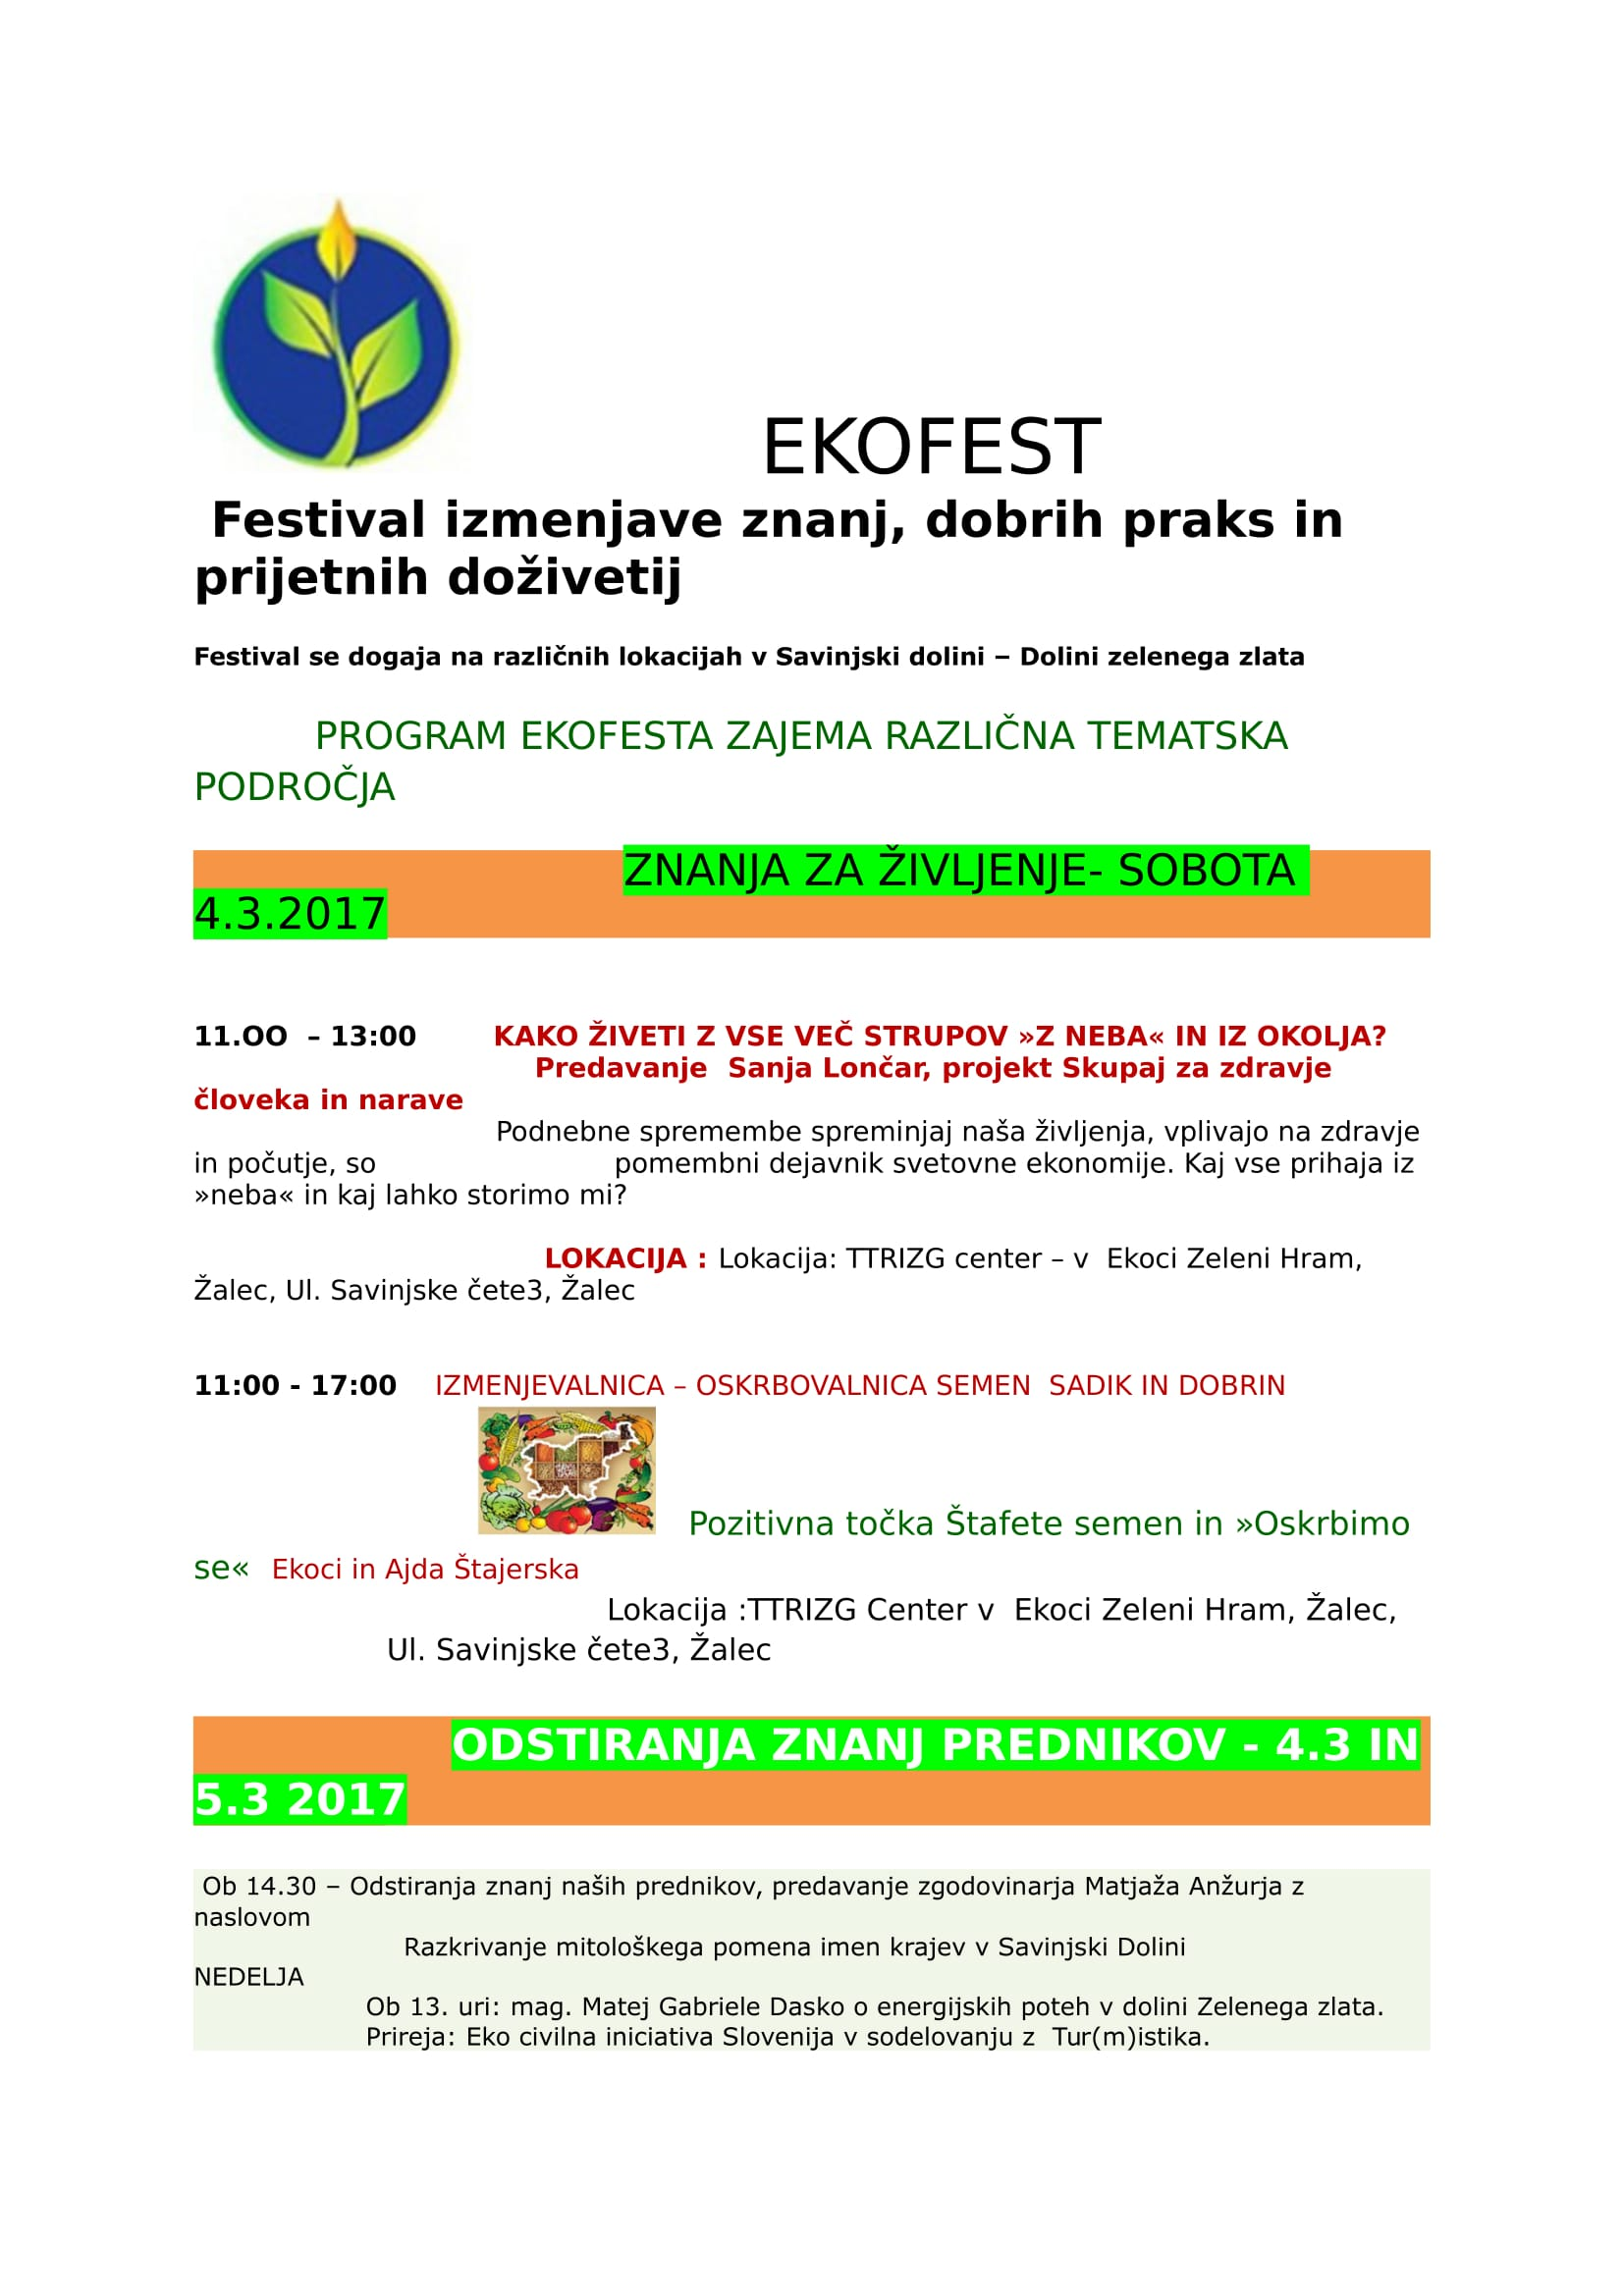 VABILO EKOFEST MAREC - festival v Savinjski dolini - dolini zelenega zlata-1